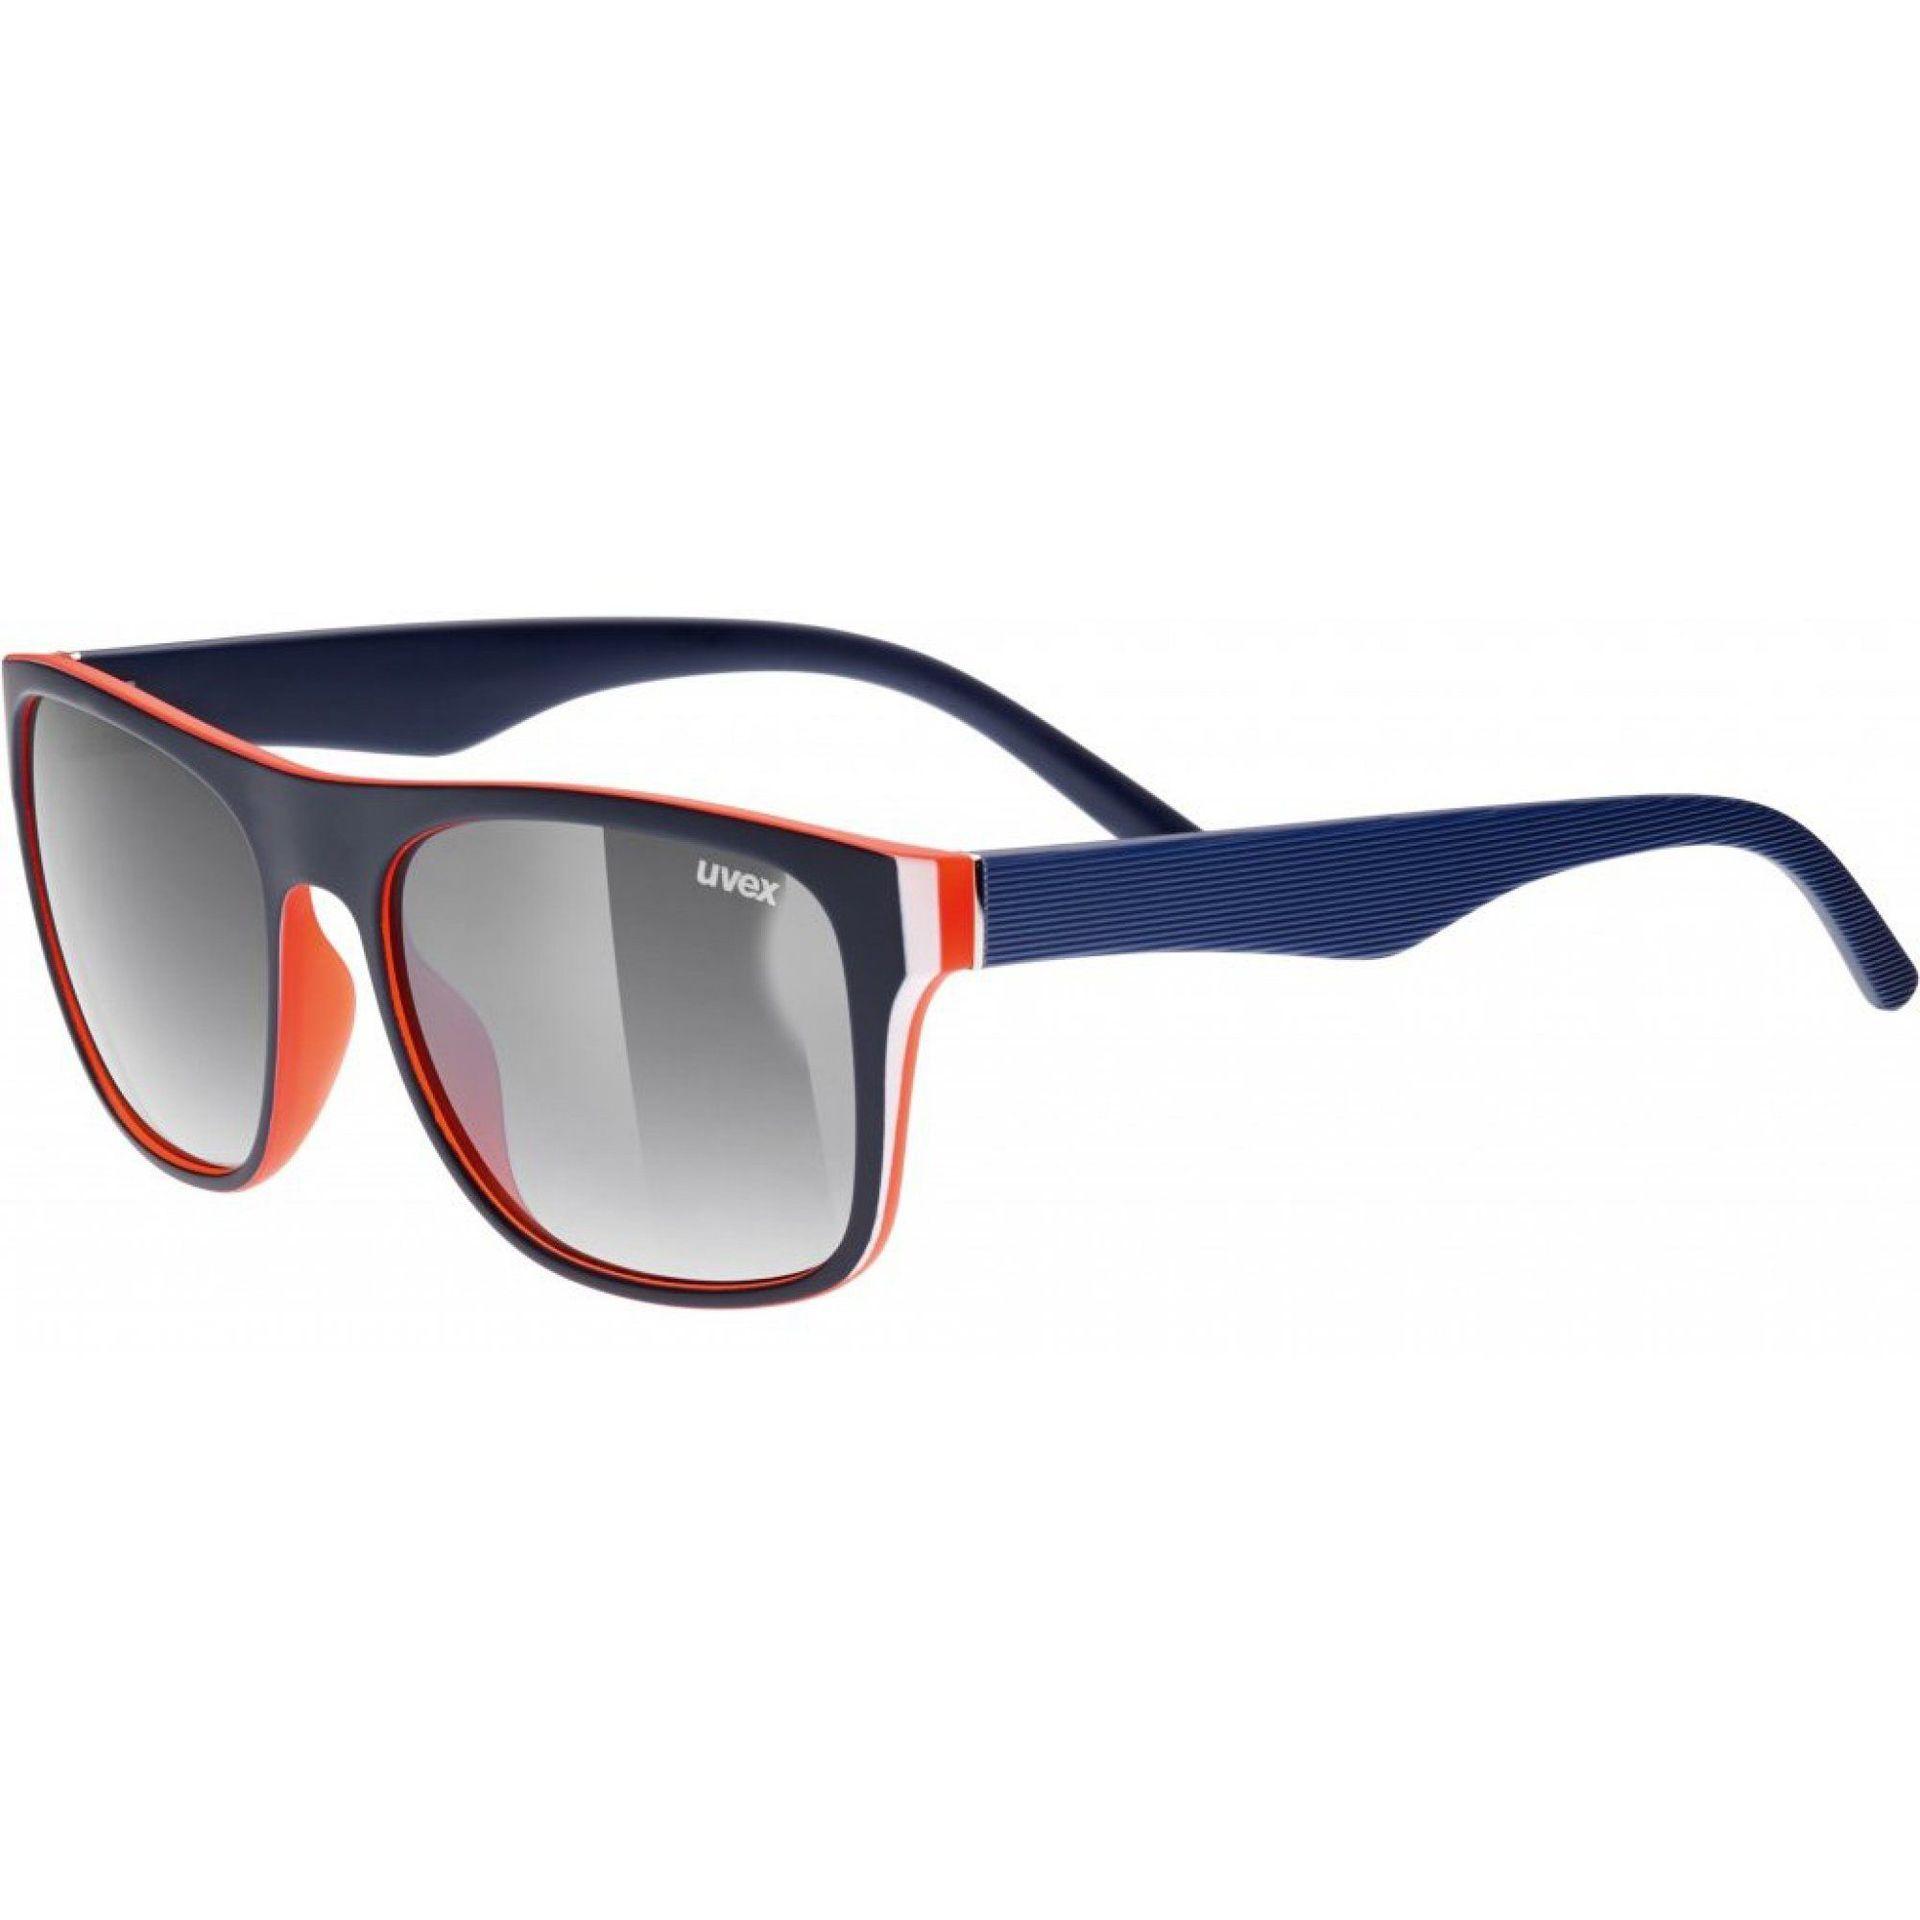 OKULARY UVEX LGL 26 BLUE RED